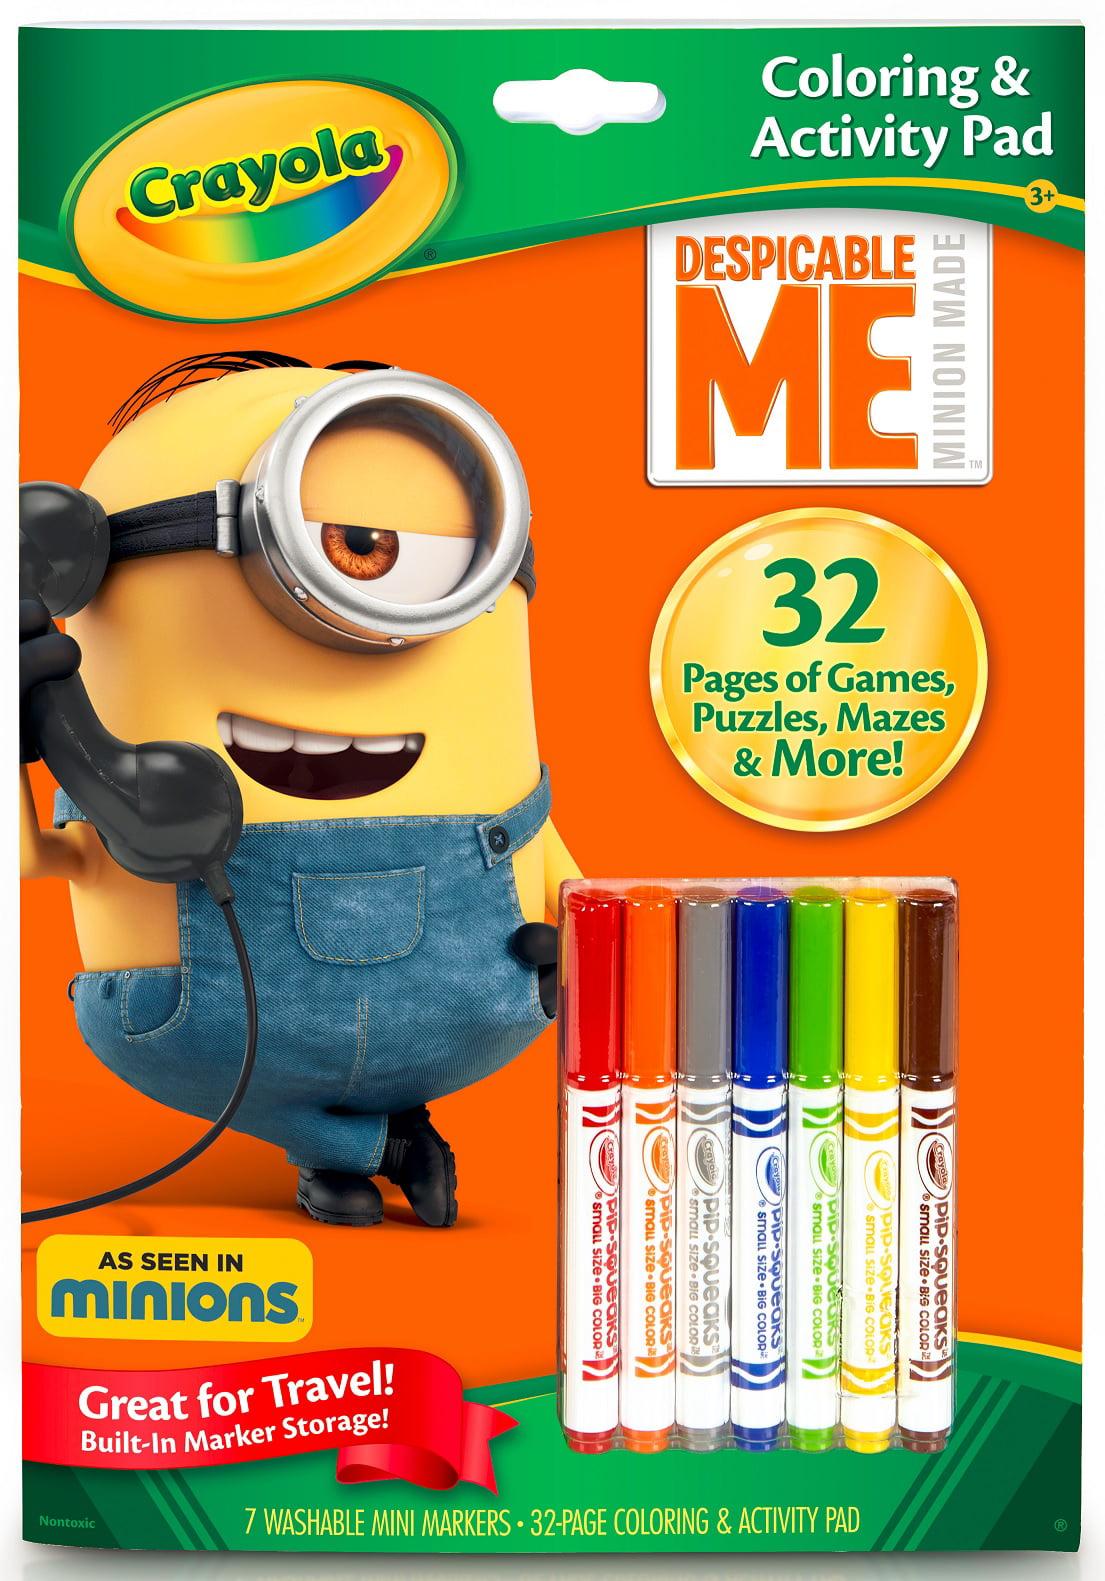 Crayola Despicable Me Coloring & Activity Book, 32 Pages, 7 Markers by Crayola